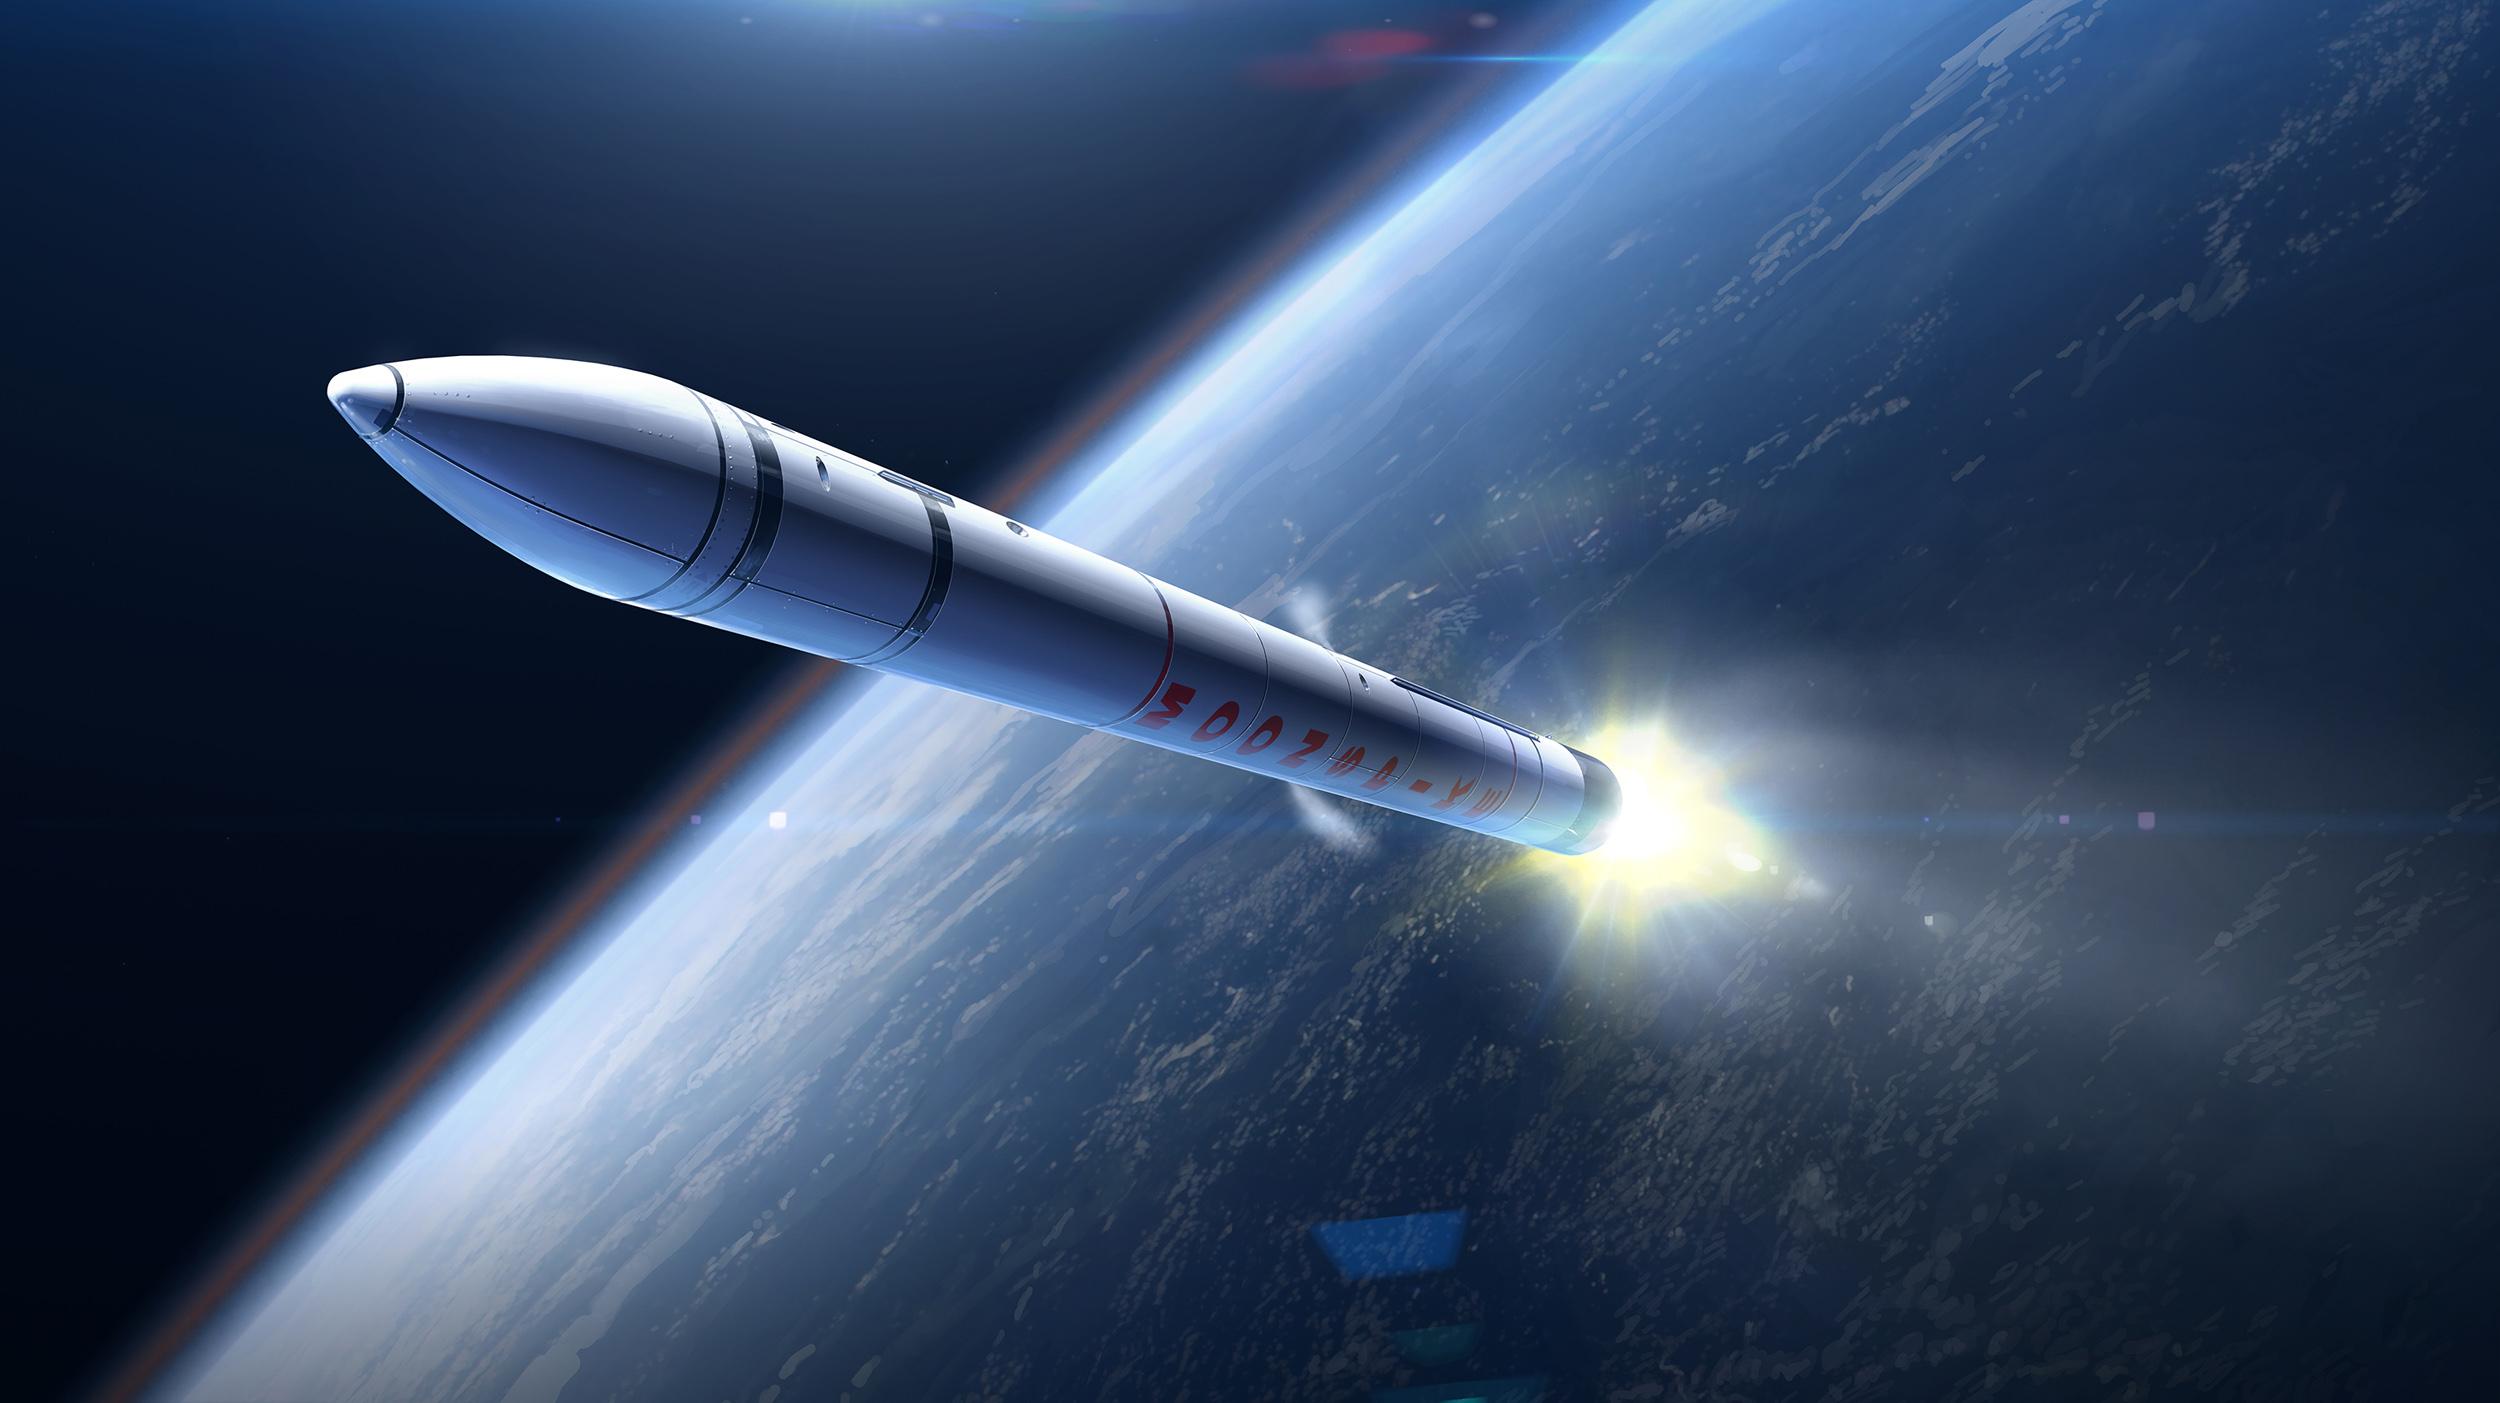 Copenhagen Suborbitals Rocket